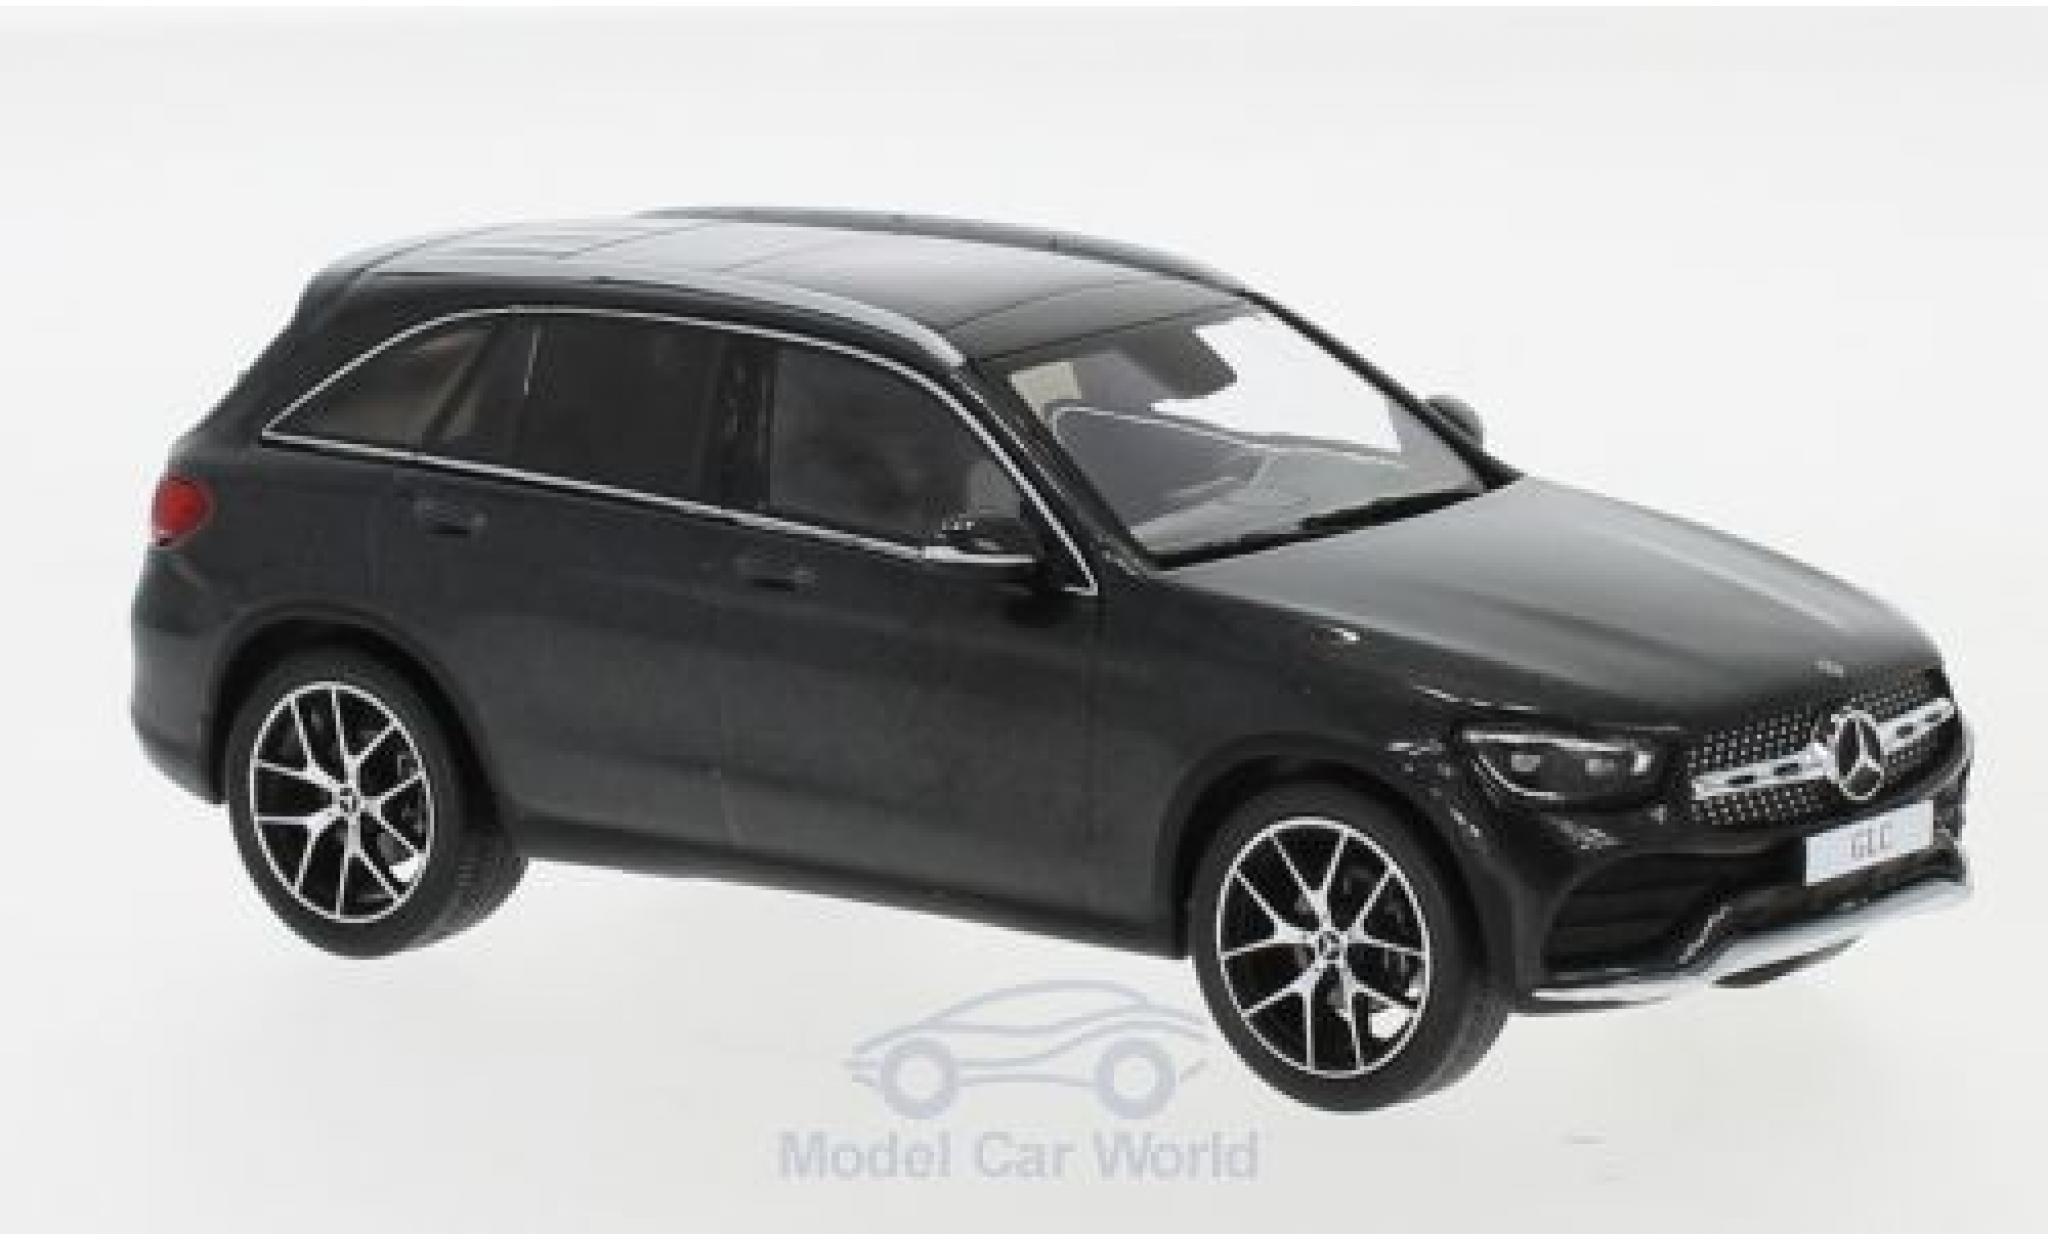 Mercedes Classe GLC 1/43 Spark GLC (X253) Mopf metallise grise 2019